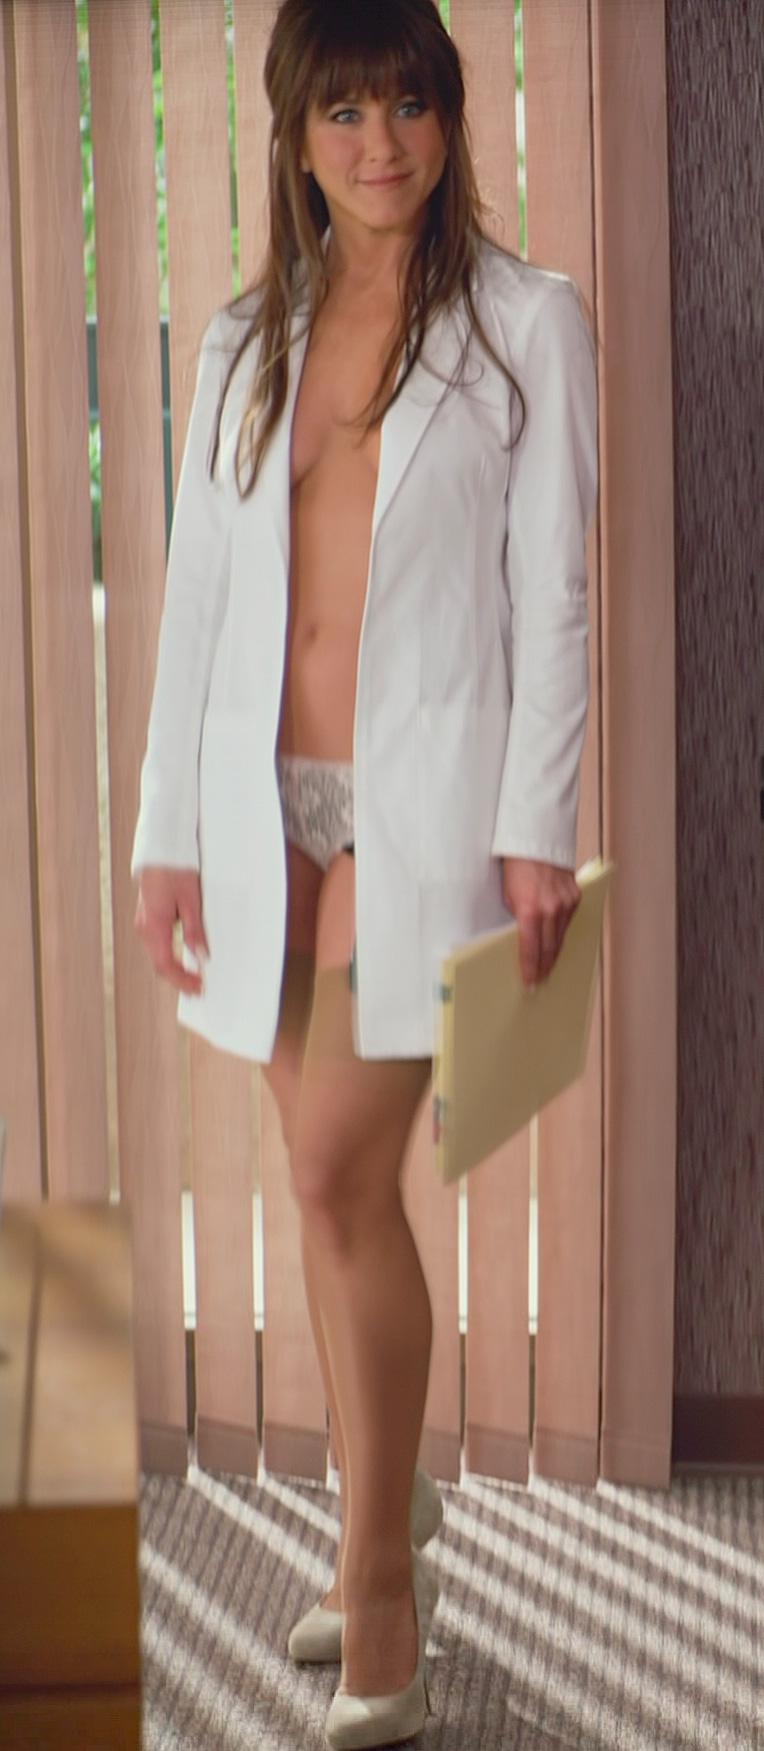 Actriz Porno Aniston jennifer aniston desnuda nude sex tape xxx